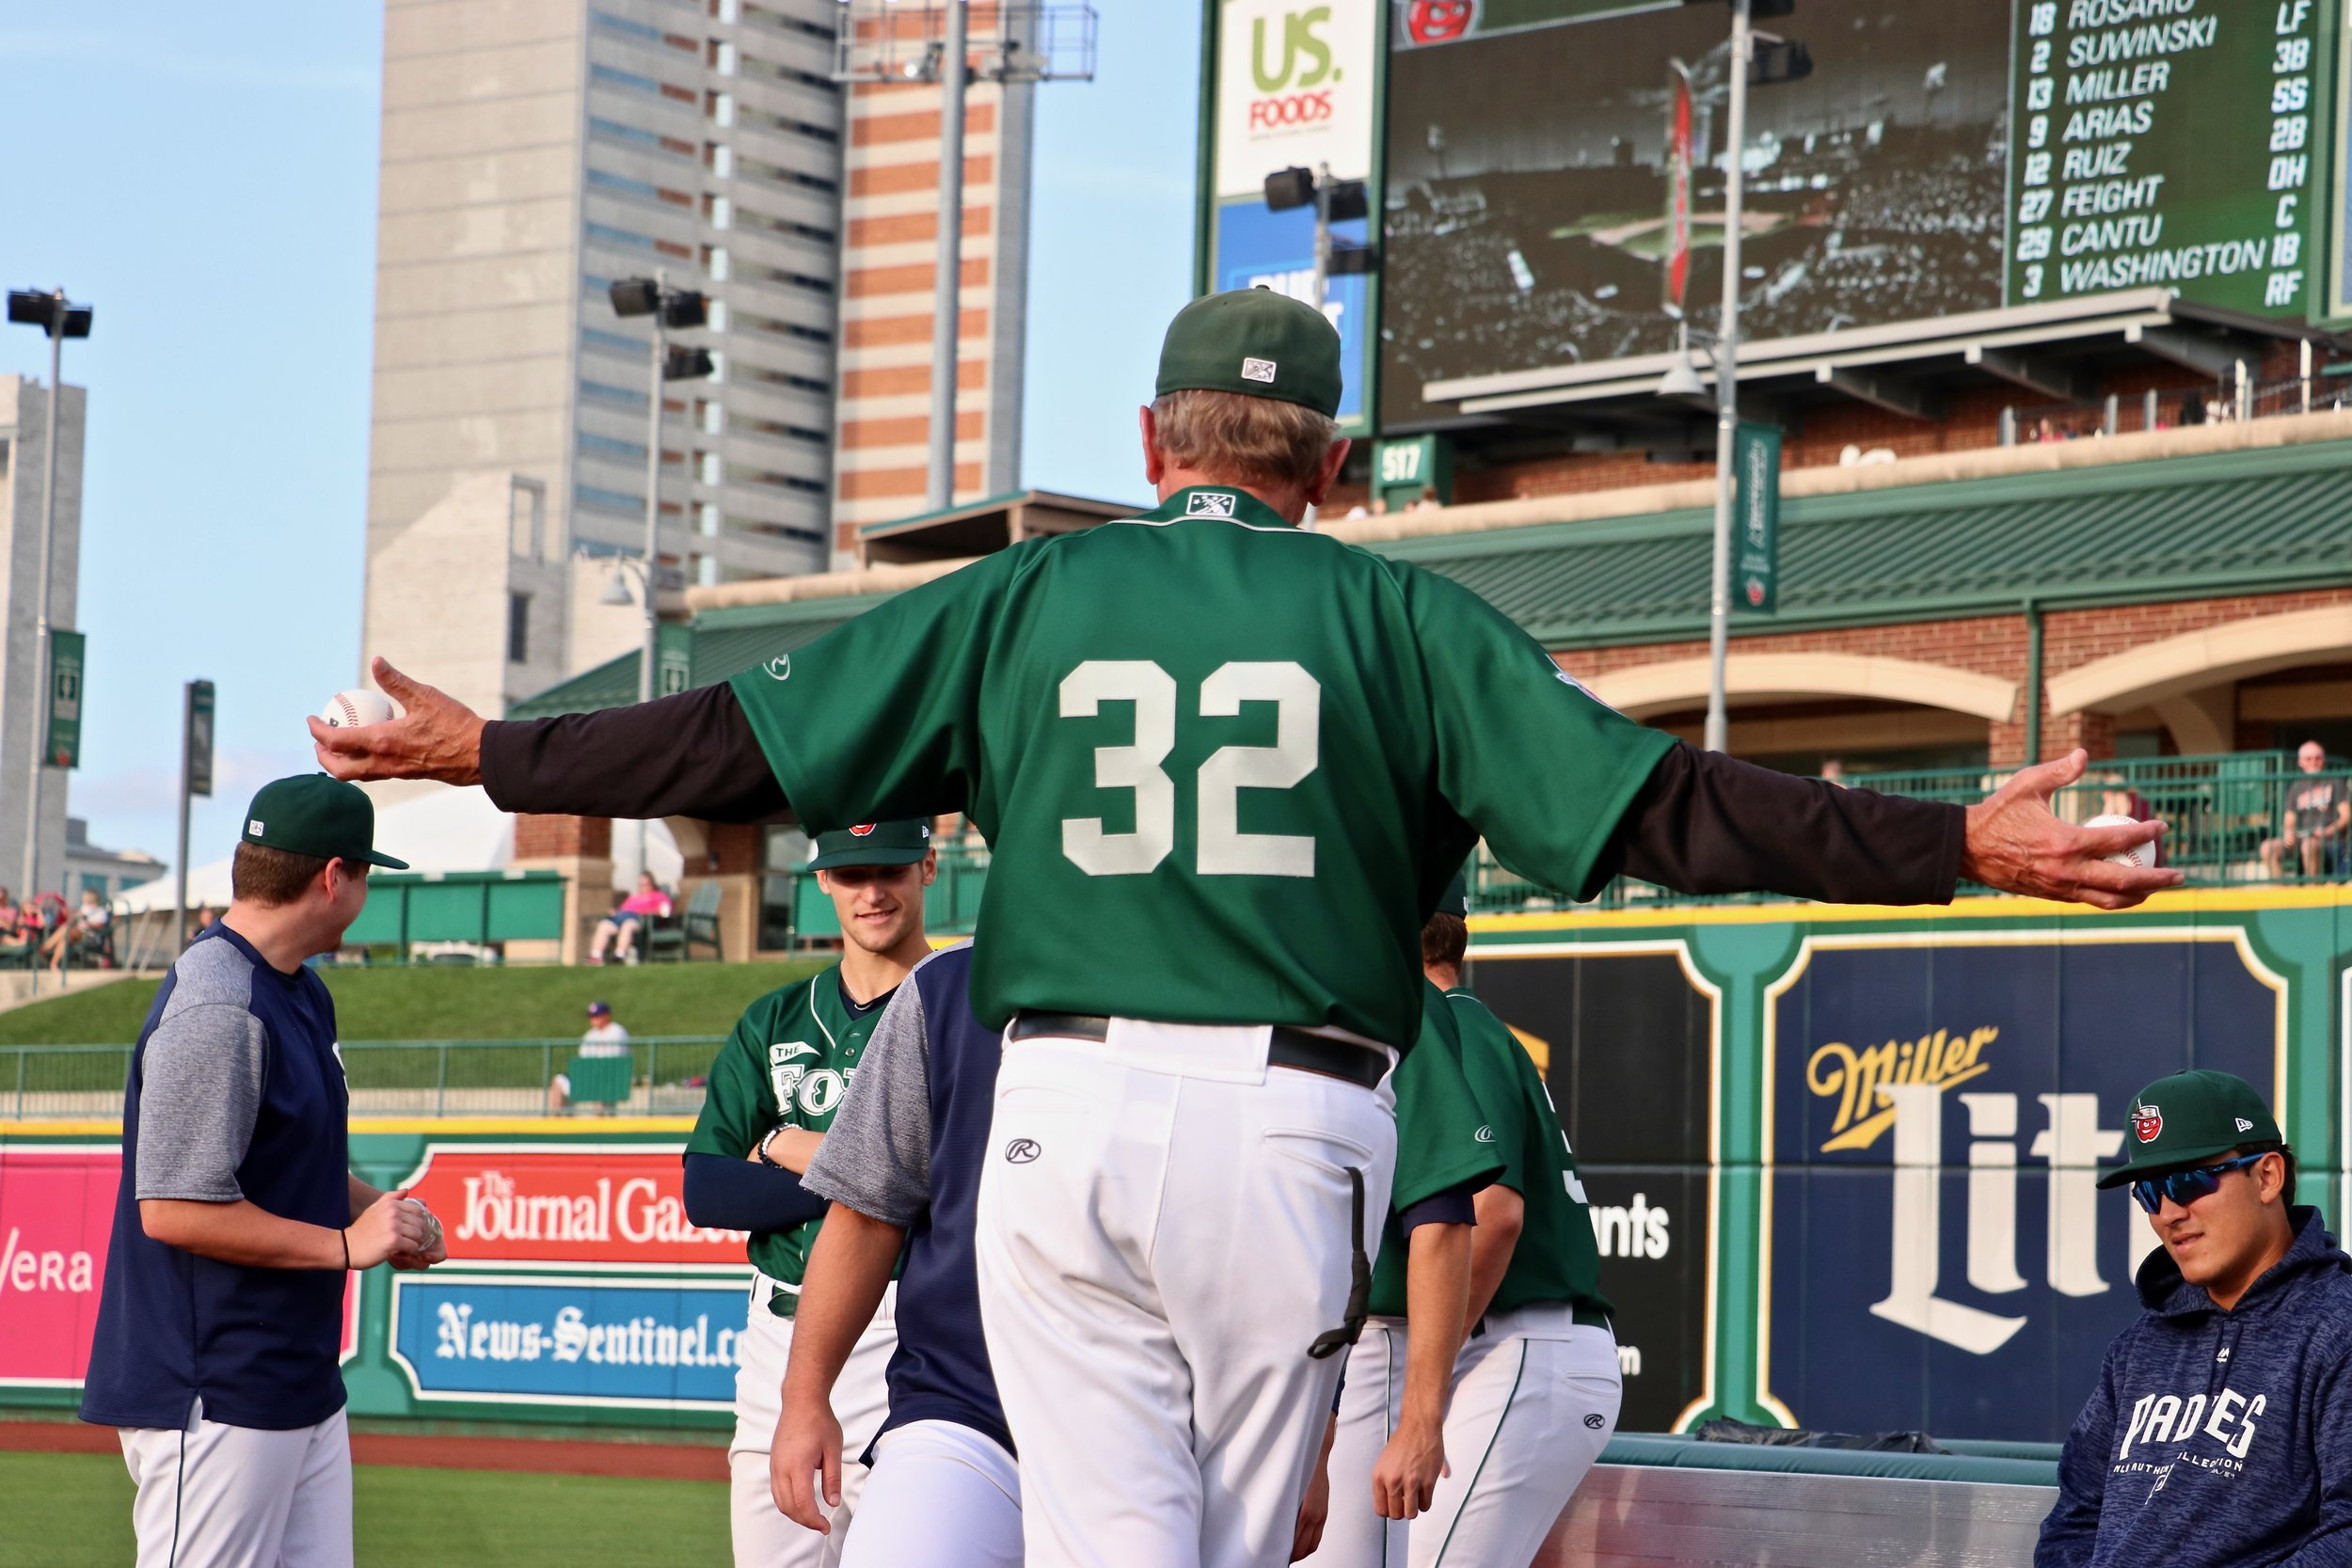 Burt Hooton standing on the Parkview Field bullpen mound in Fort Wayne, Indiana, holding two baseballs. Photo credit: Lance Brozdowski